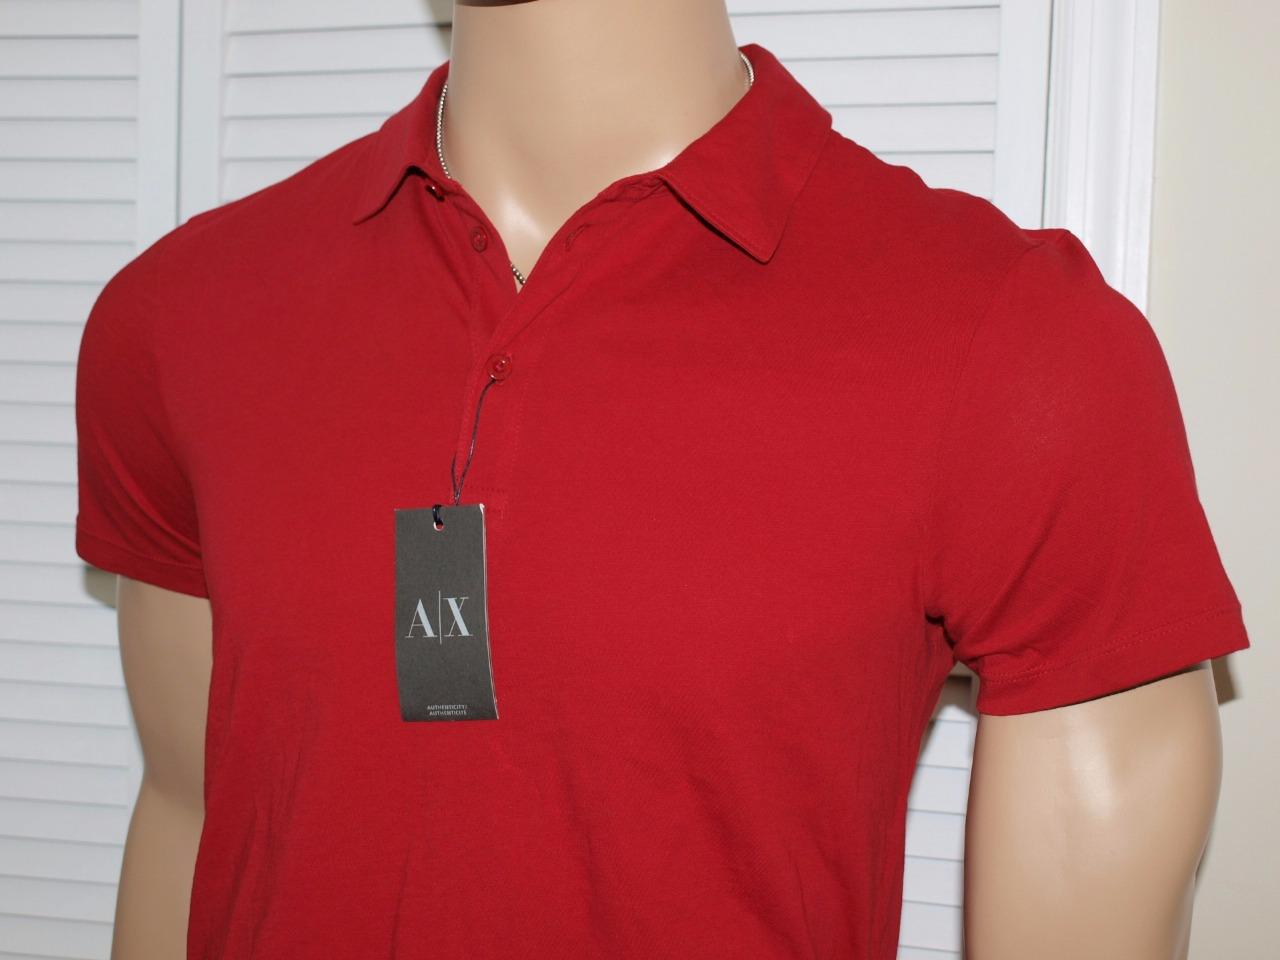 Armani Exchange Pima Cotton Polo Shirt Ruby Red Nwt Ebay